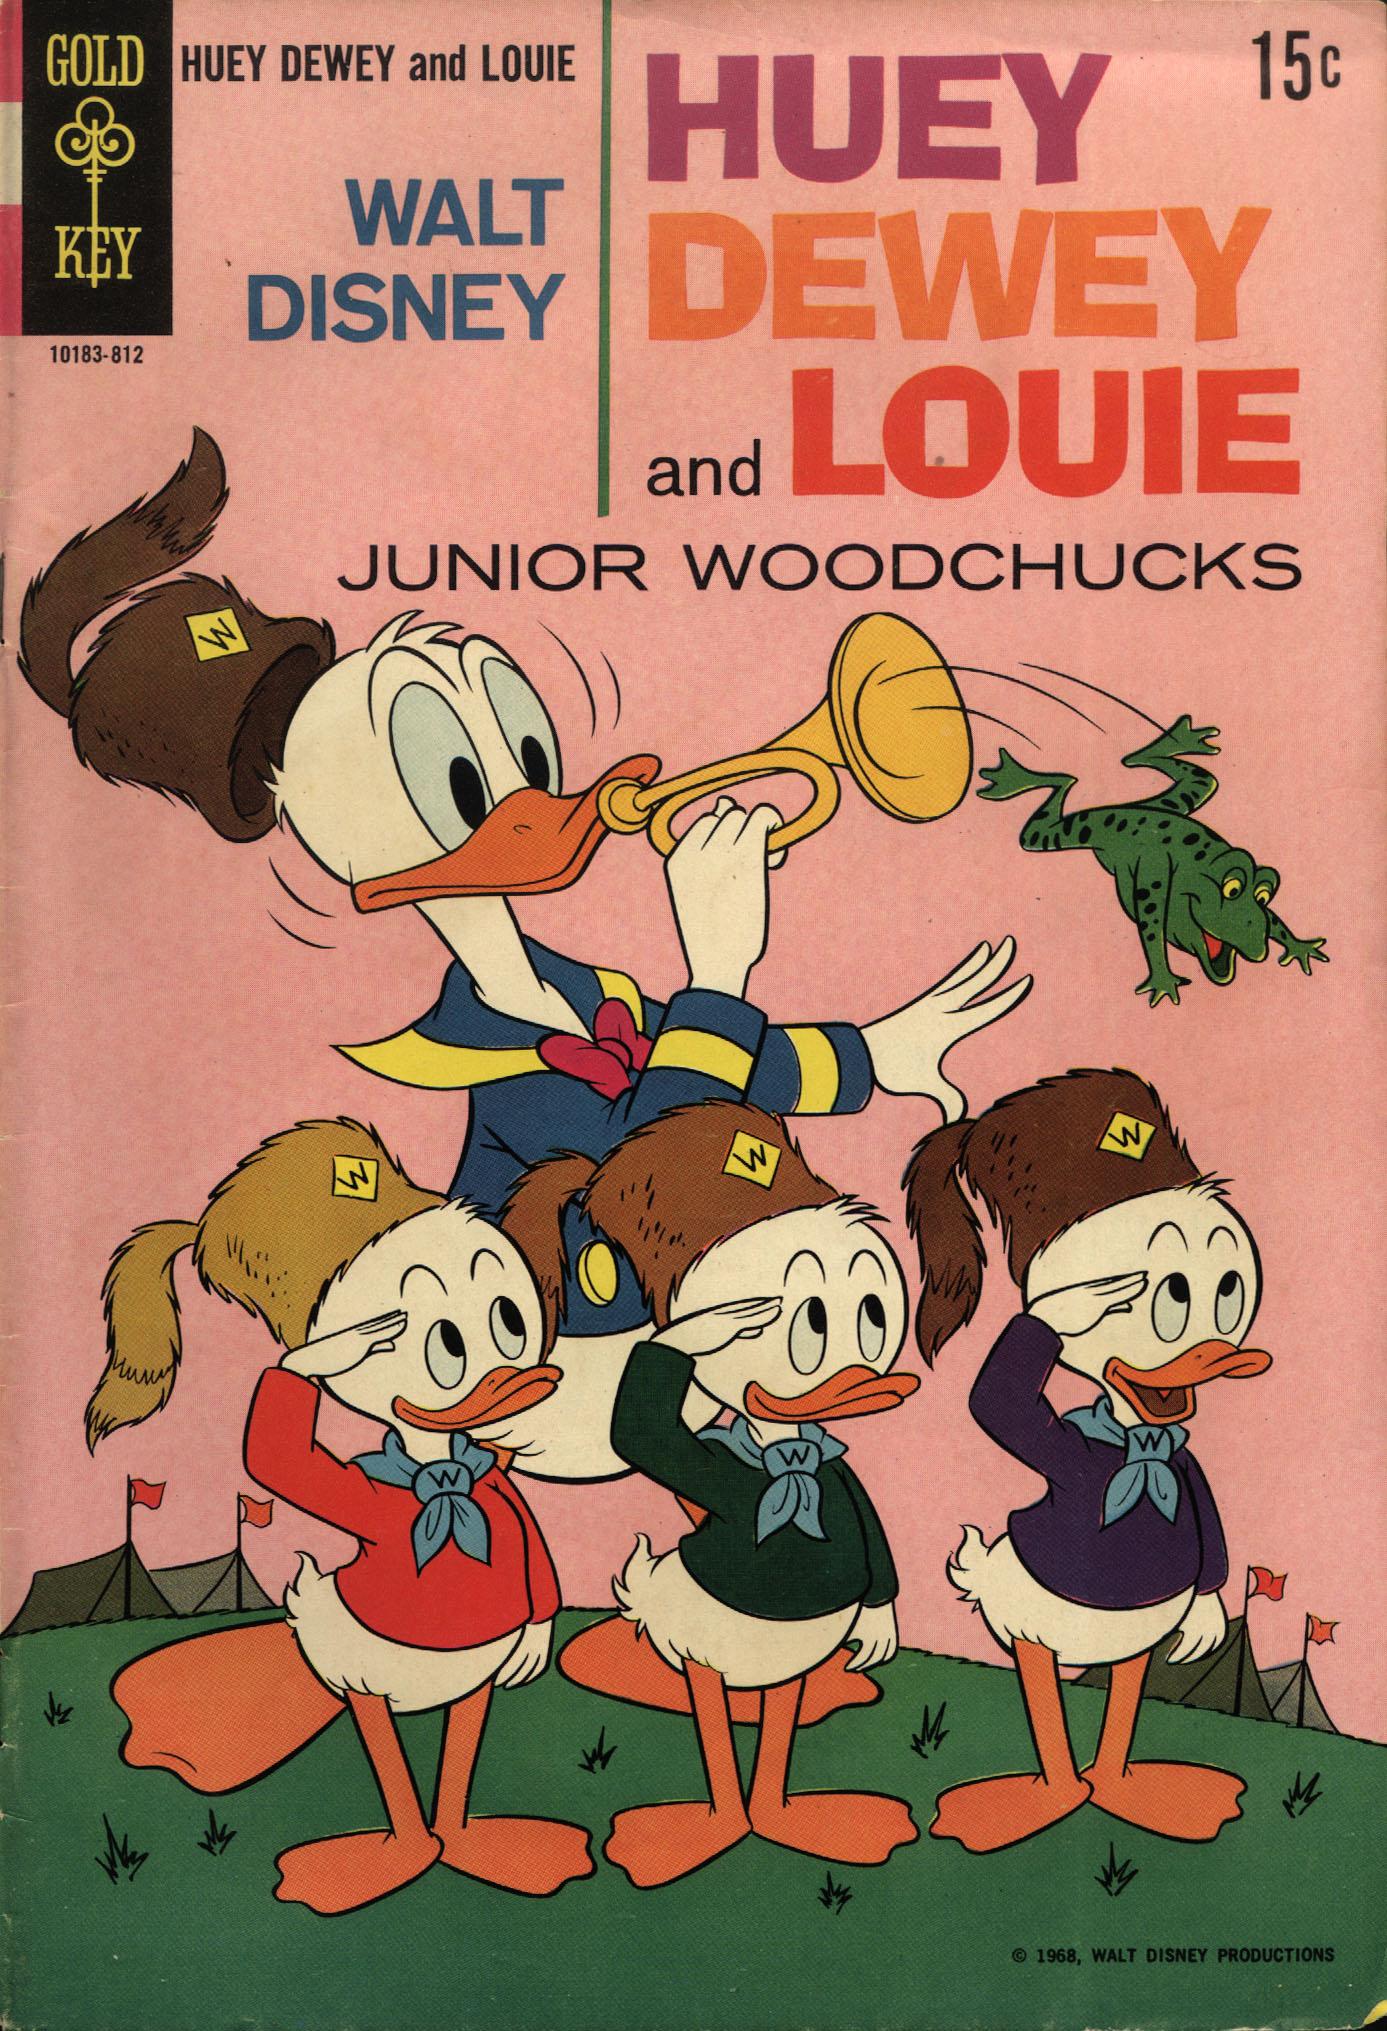 Huey, Dewey, and Louie Junior Woodchucks 3 Page 1